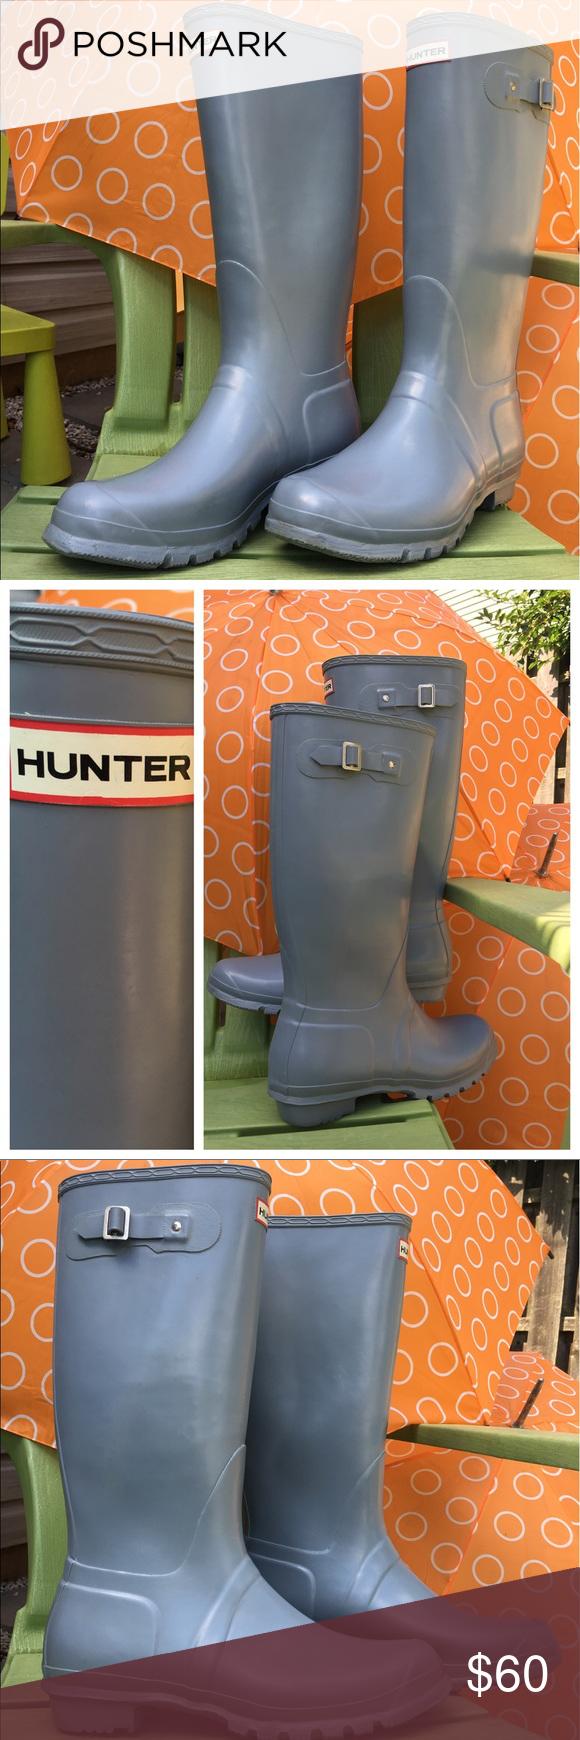 Hunter Rain Boots Gray Size 13 Men 14 Women   Rain boot